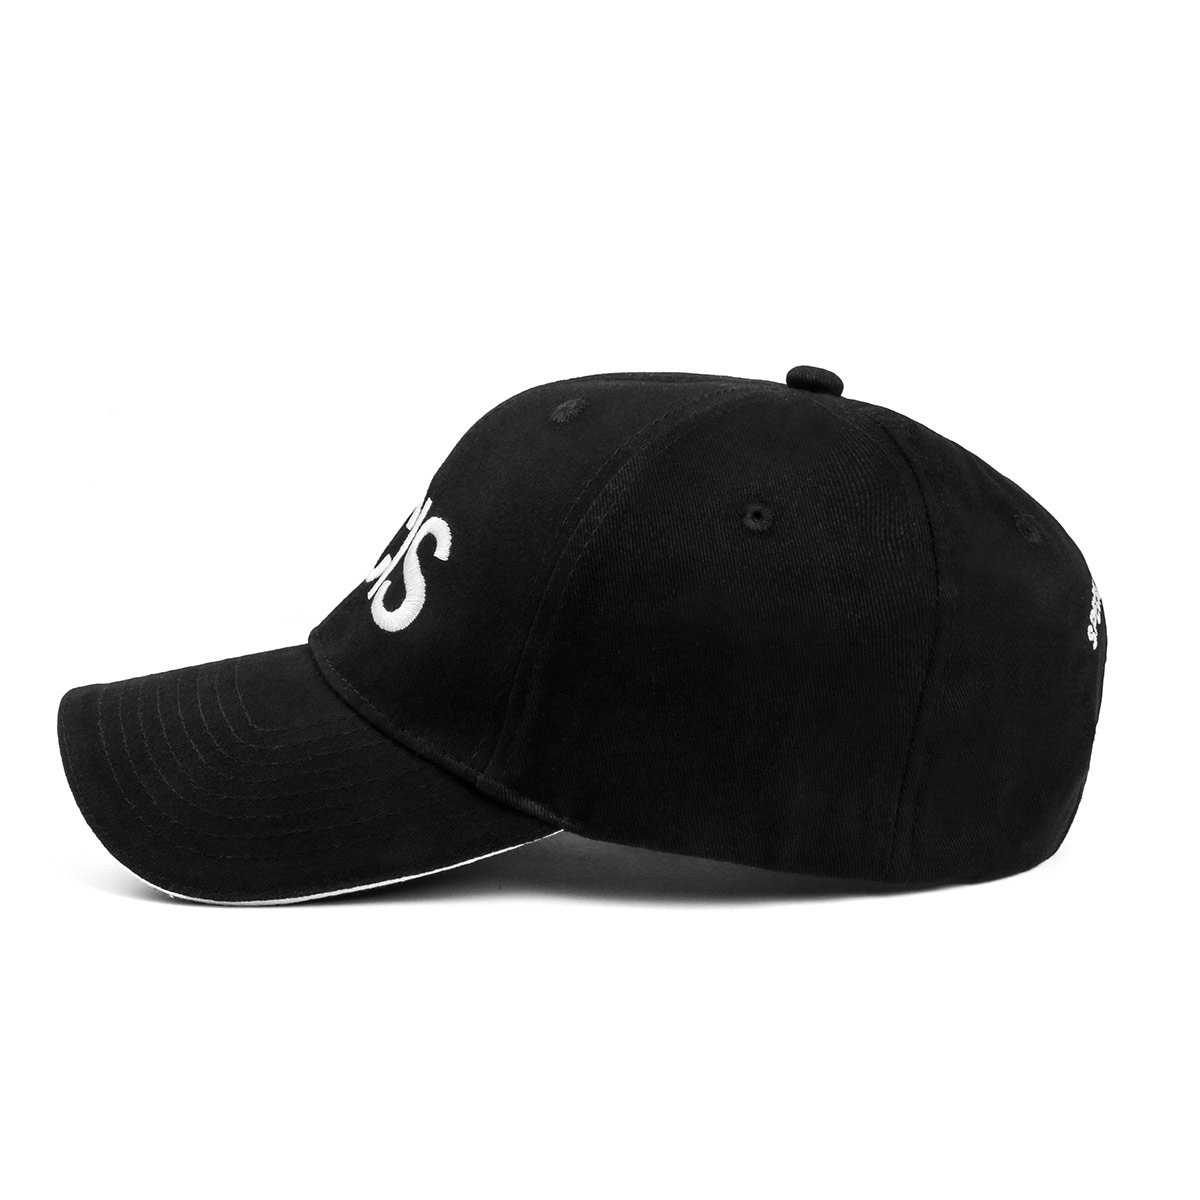 NCIS Special Agents Cap Naval Criminal Investigative Service Embroidered  Adjustable Cotton Baseball Cap Hat  (Black ) 648e1a6d1bc5